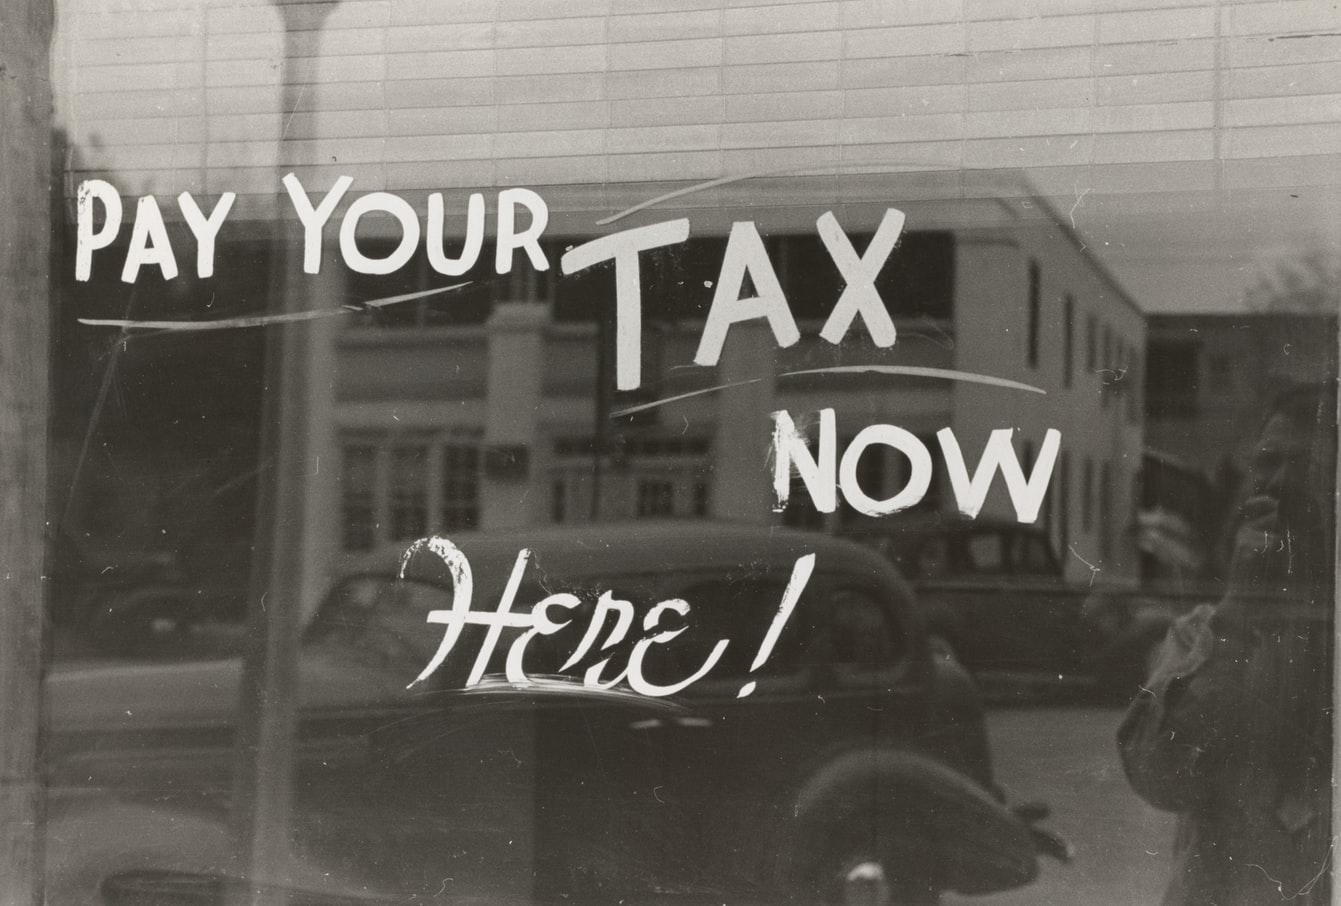 La taxation